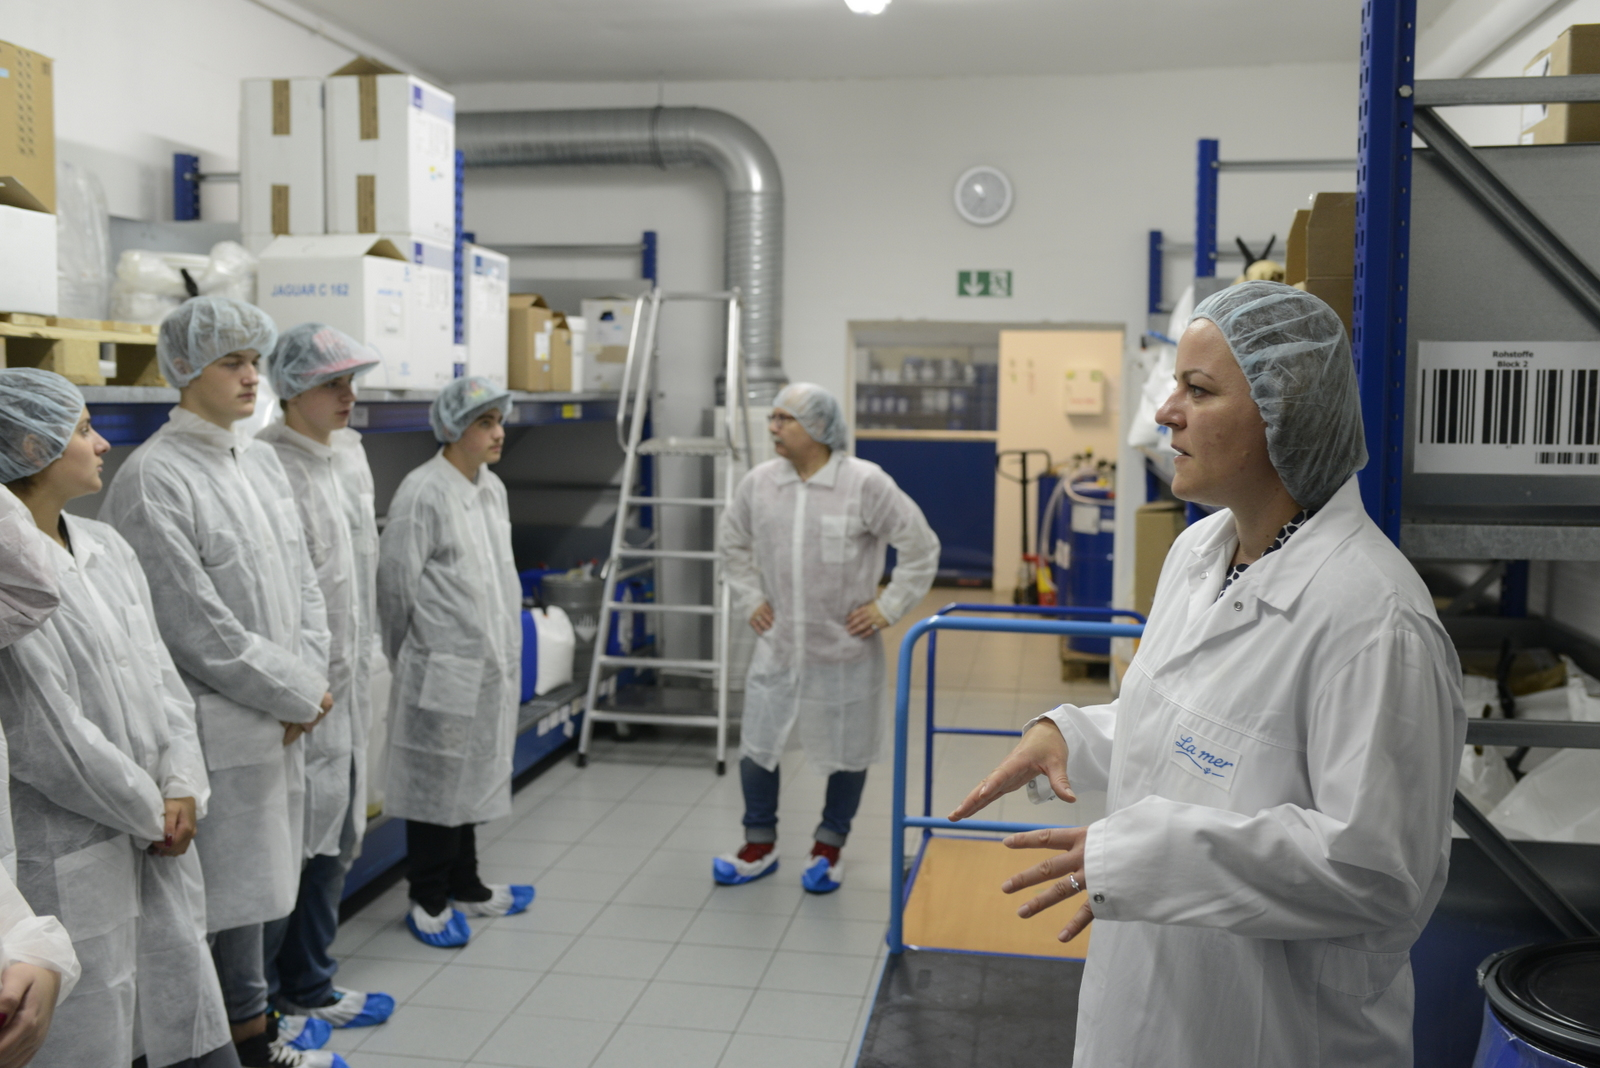 Entrepreneurship-Seminar besucht LaMer in Cuxhaven